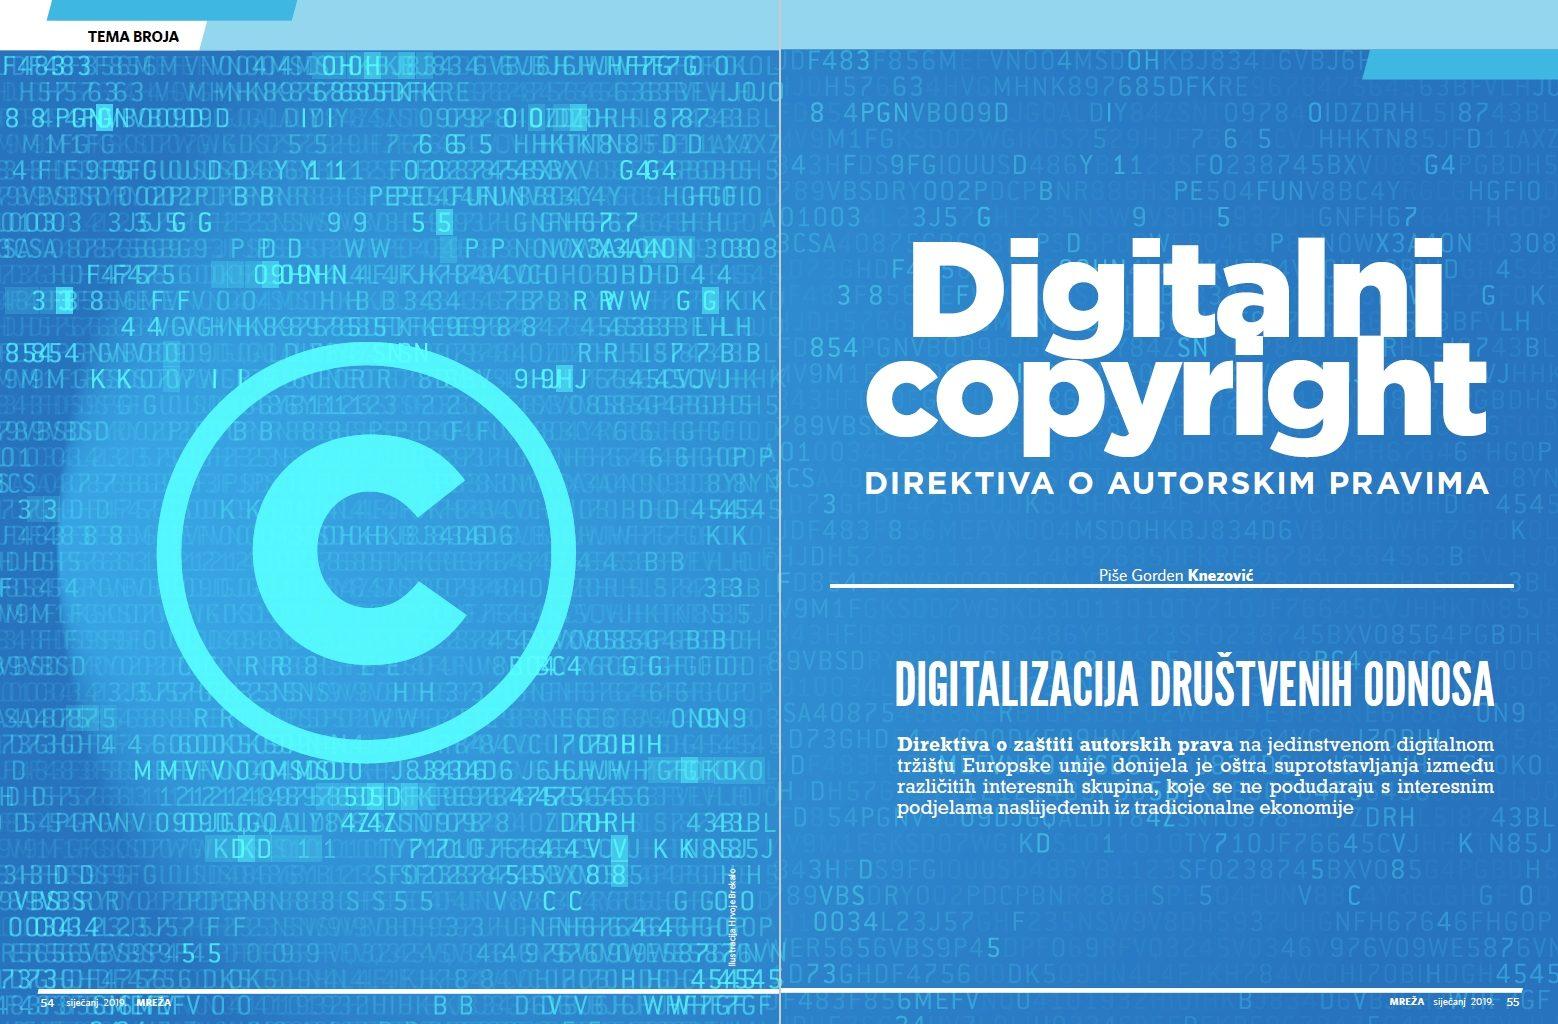 Nova Mreža: Digitalni copyright i hardver za mobilni rad